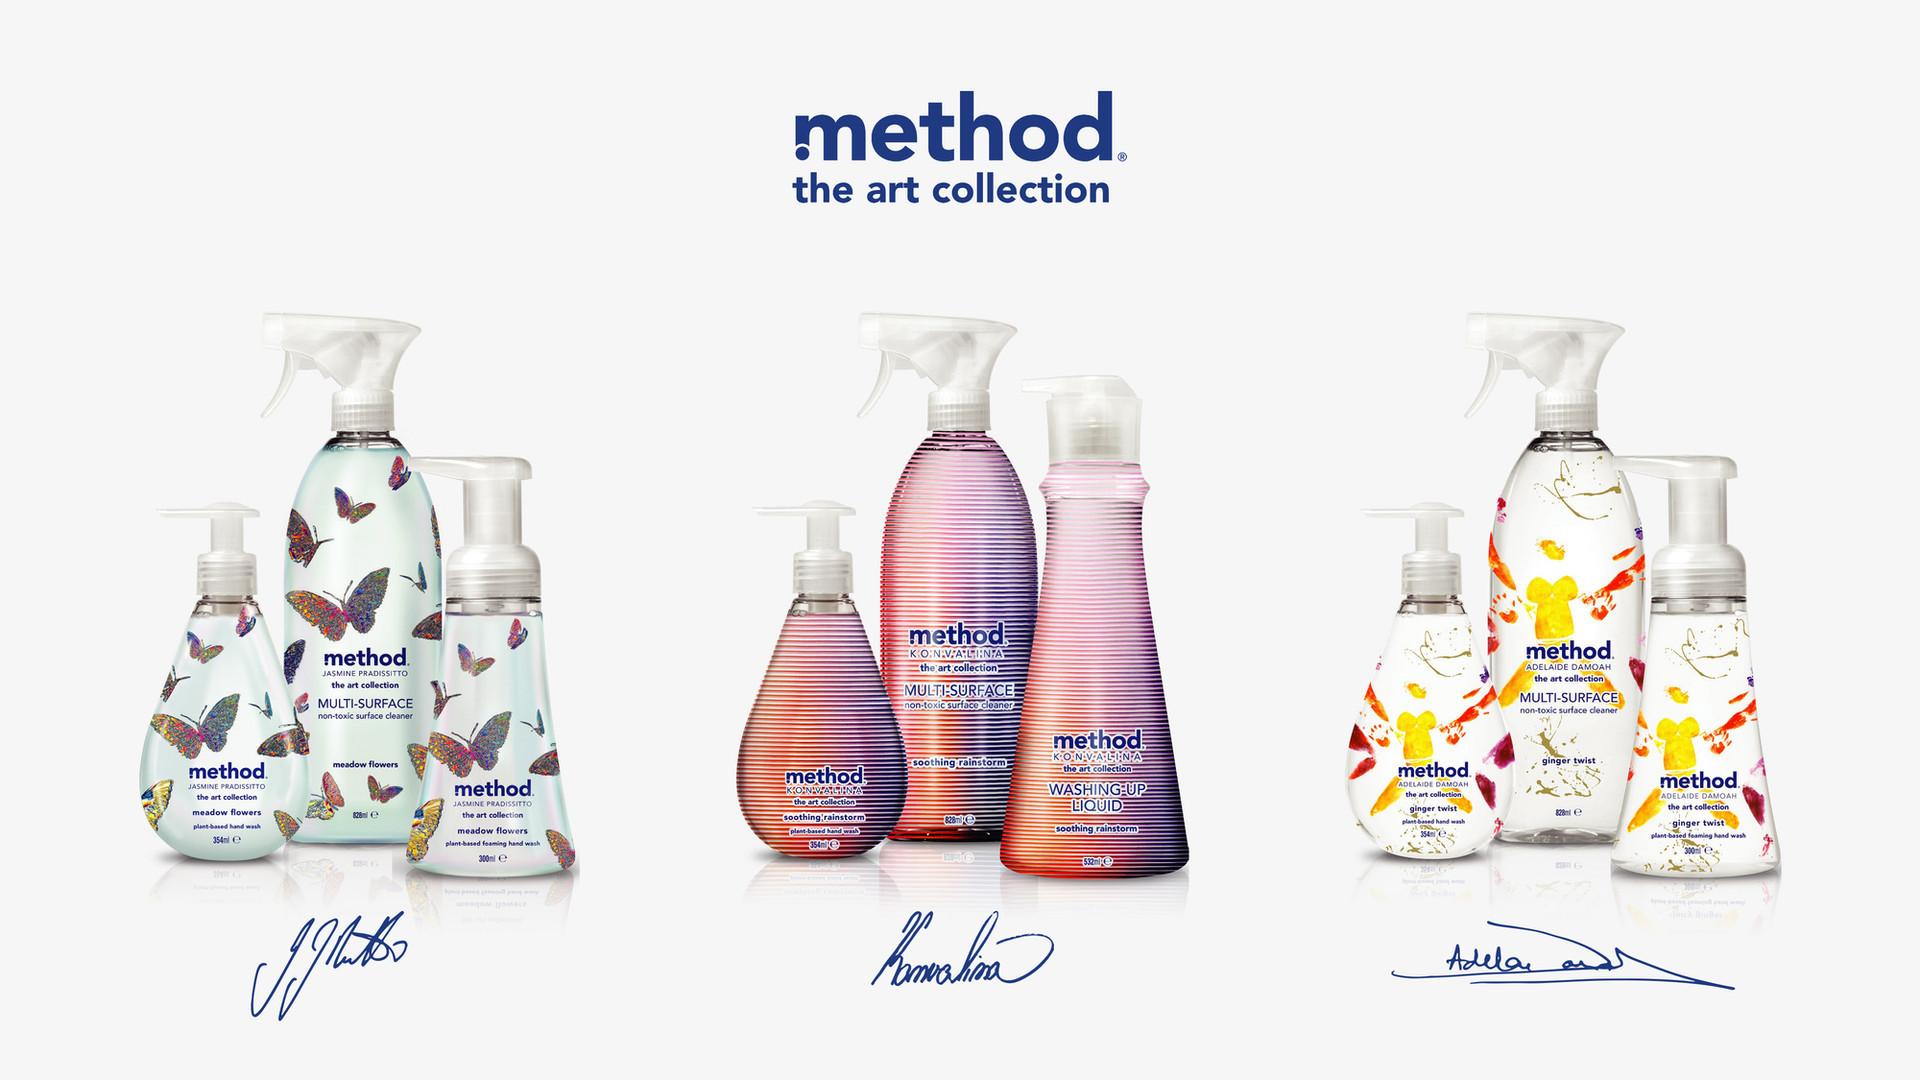 4K Gallery method The Art Collection.jpg